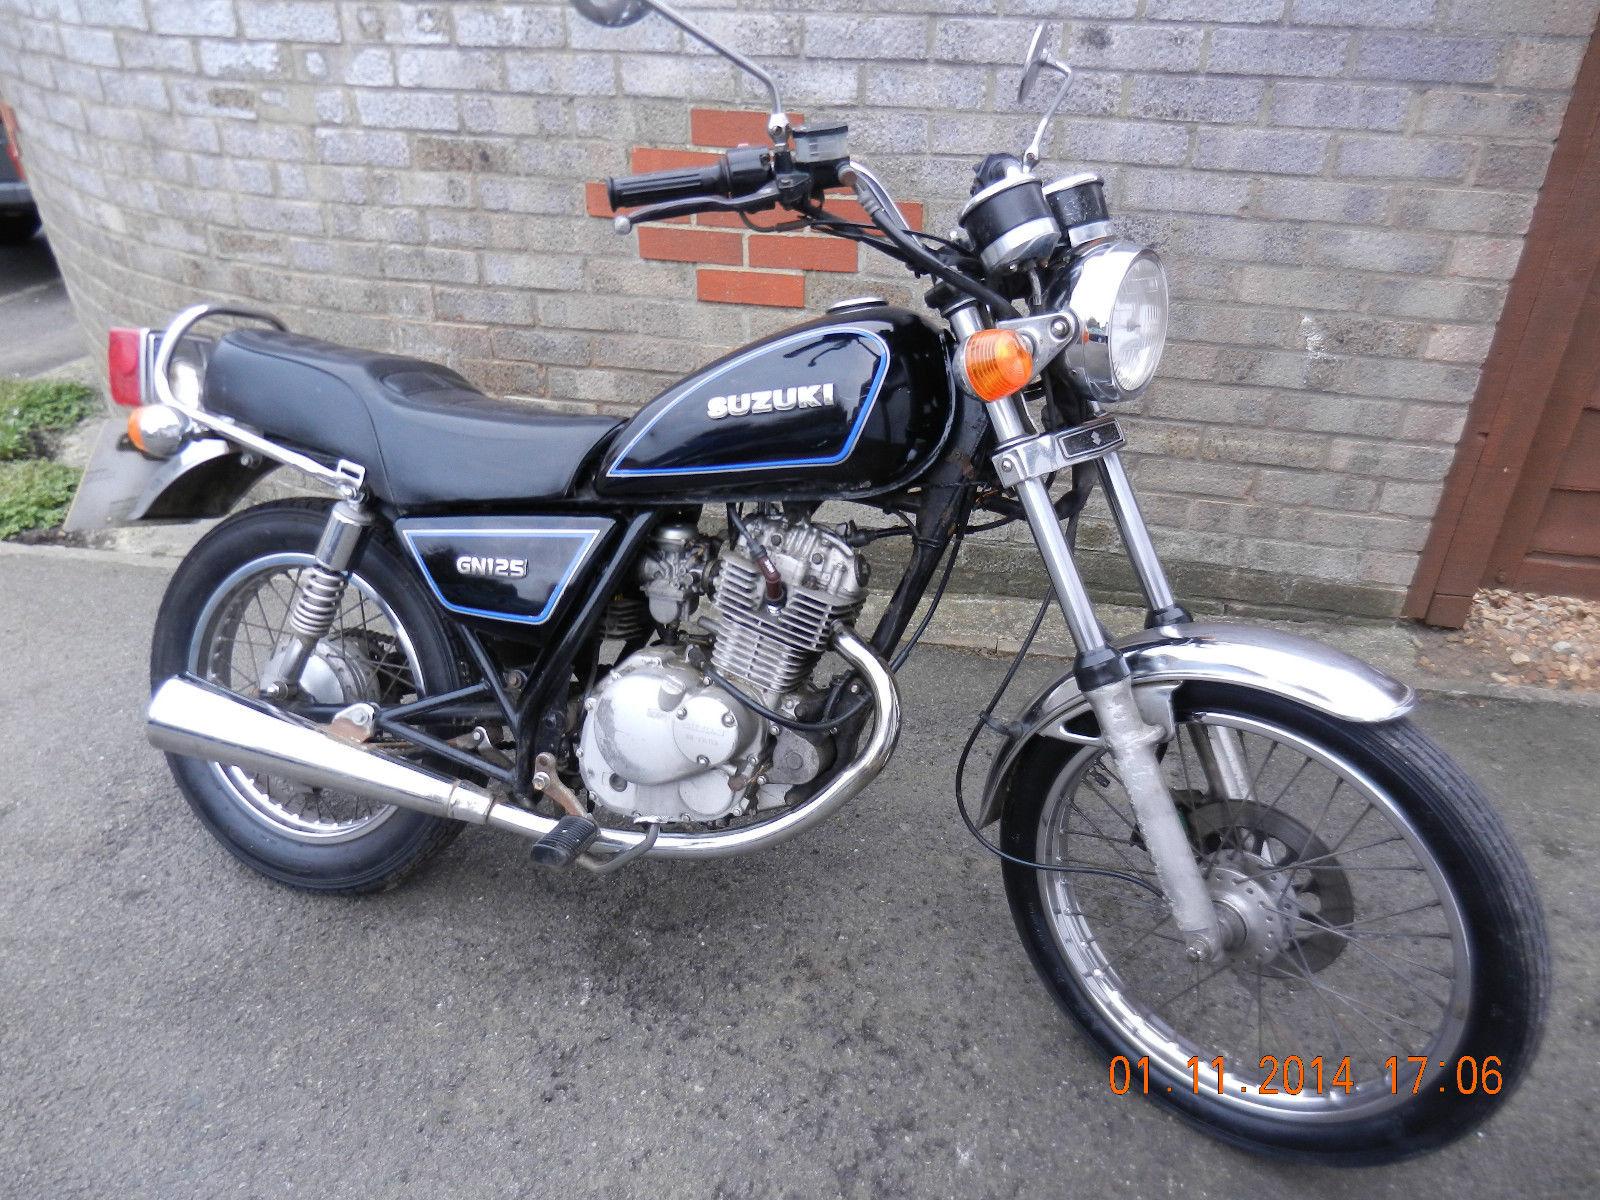 Suzuki Gn125 Gn 125 1994 Classic Learner Restoration Project Brat Bobber Custom